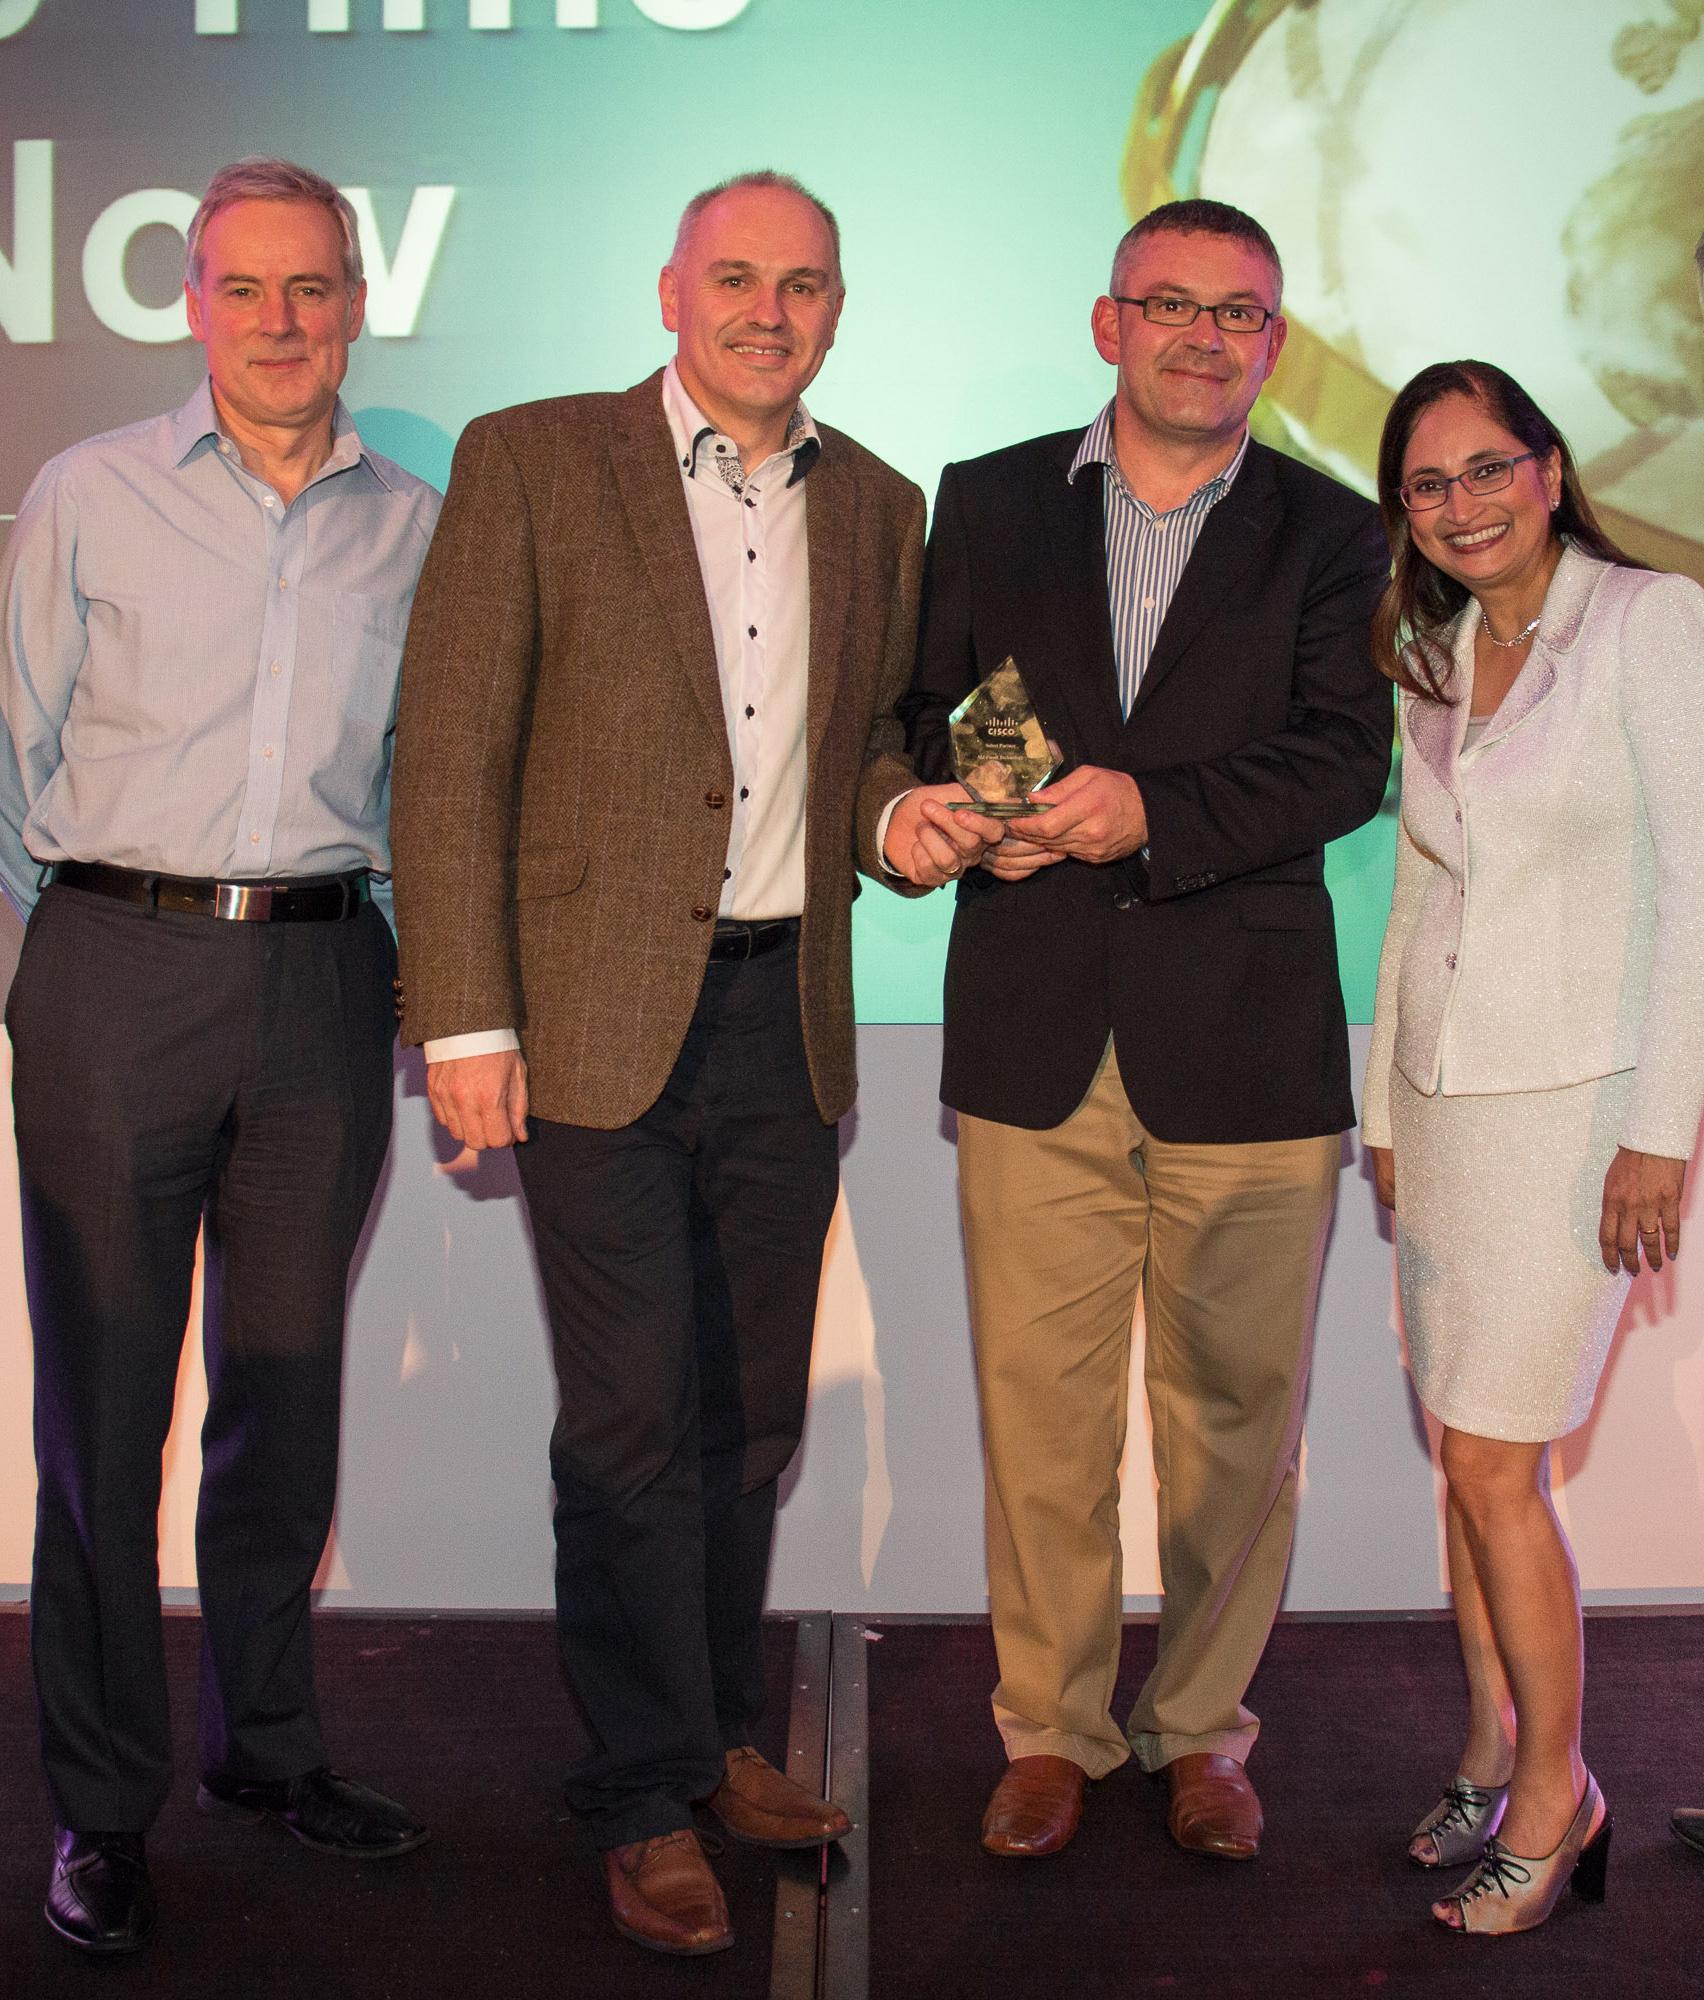 MJ Flood Technology recognised with Irish Partner award for 'Cisco Ireland Select Partner of the Year FY14' at Cisco's FY14 Ireland Partner Forum